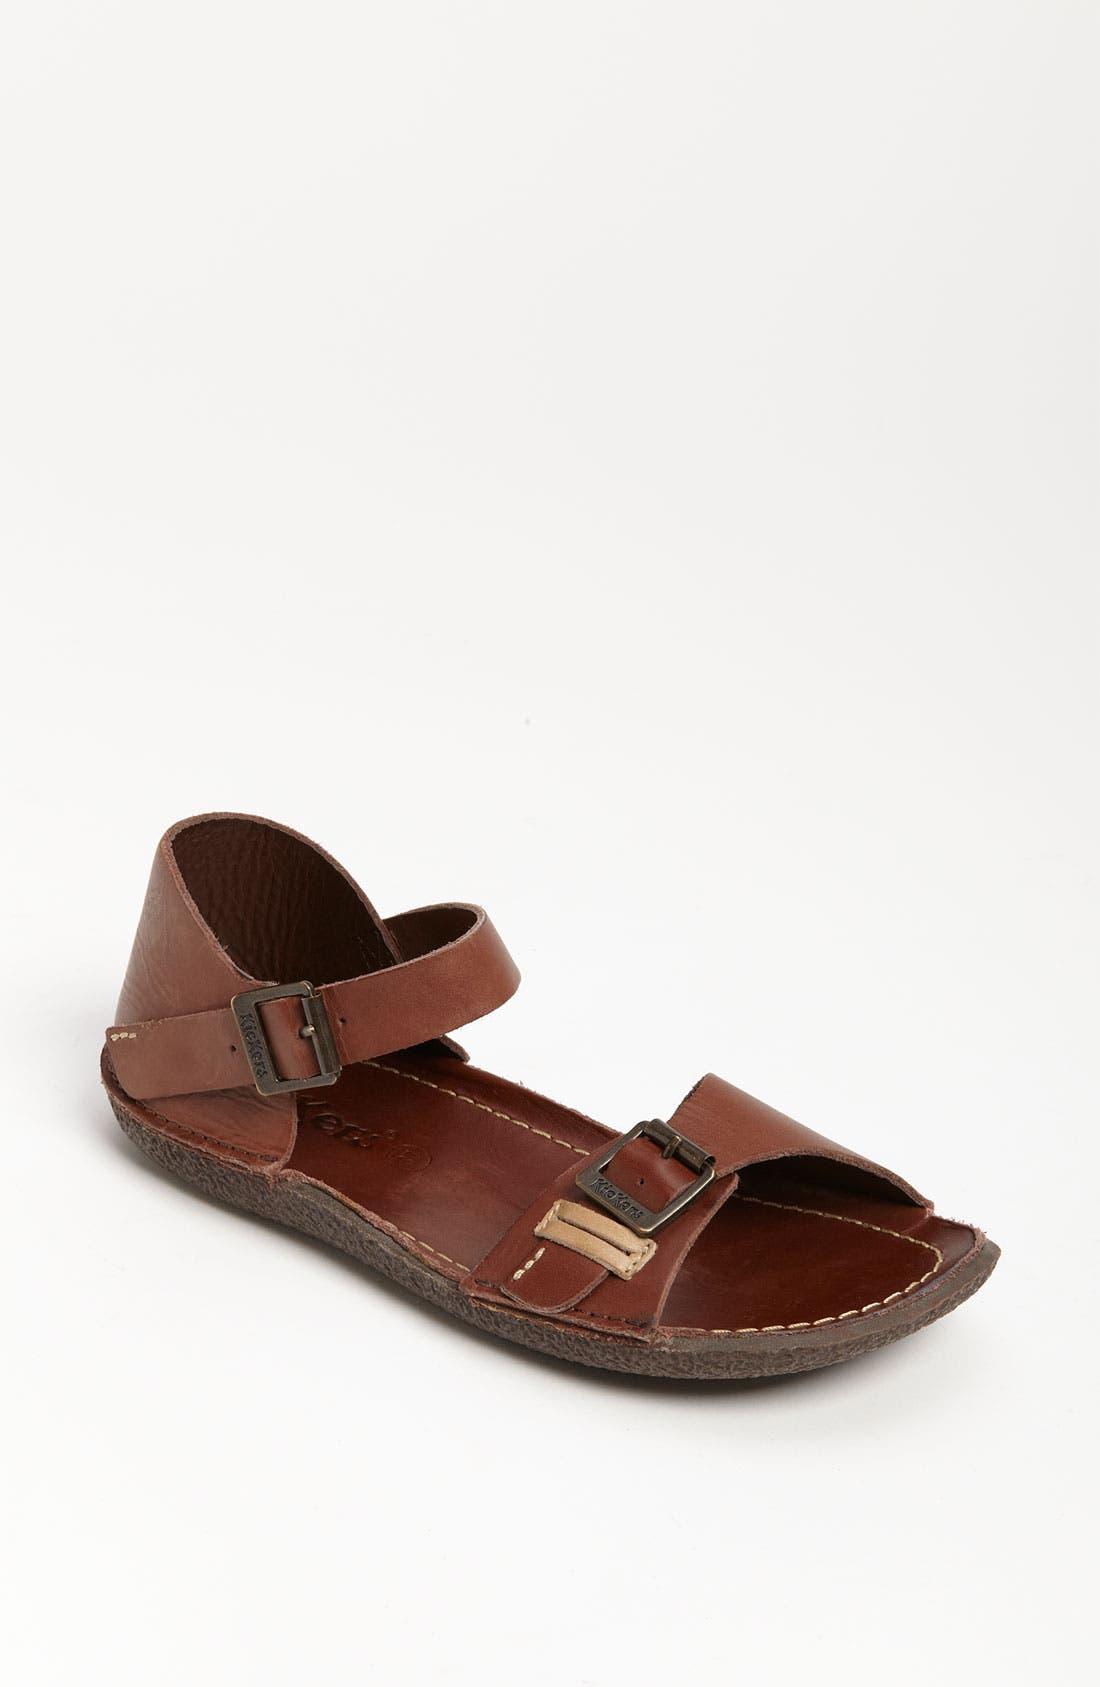 Alternate Image 1 Selected - Kickers 'Pastille' Sandal